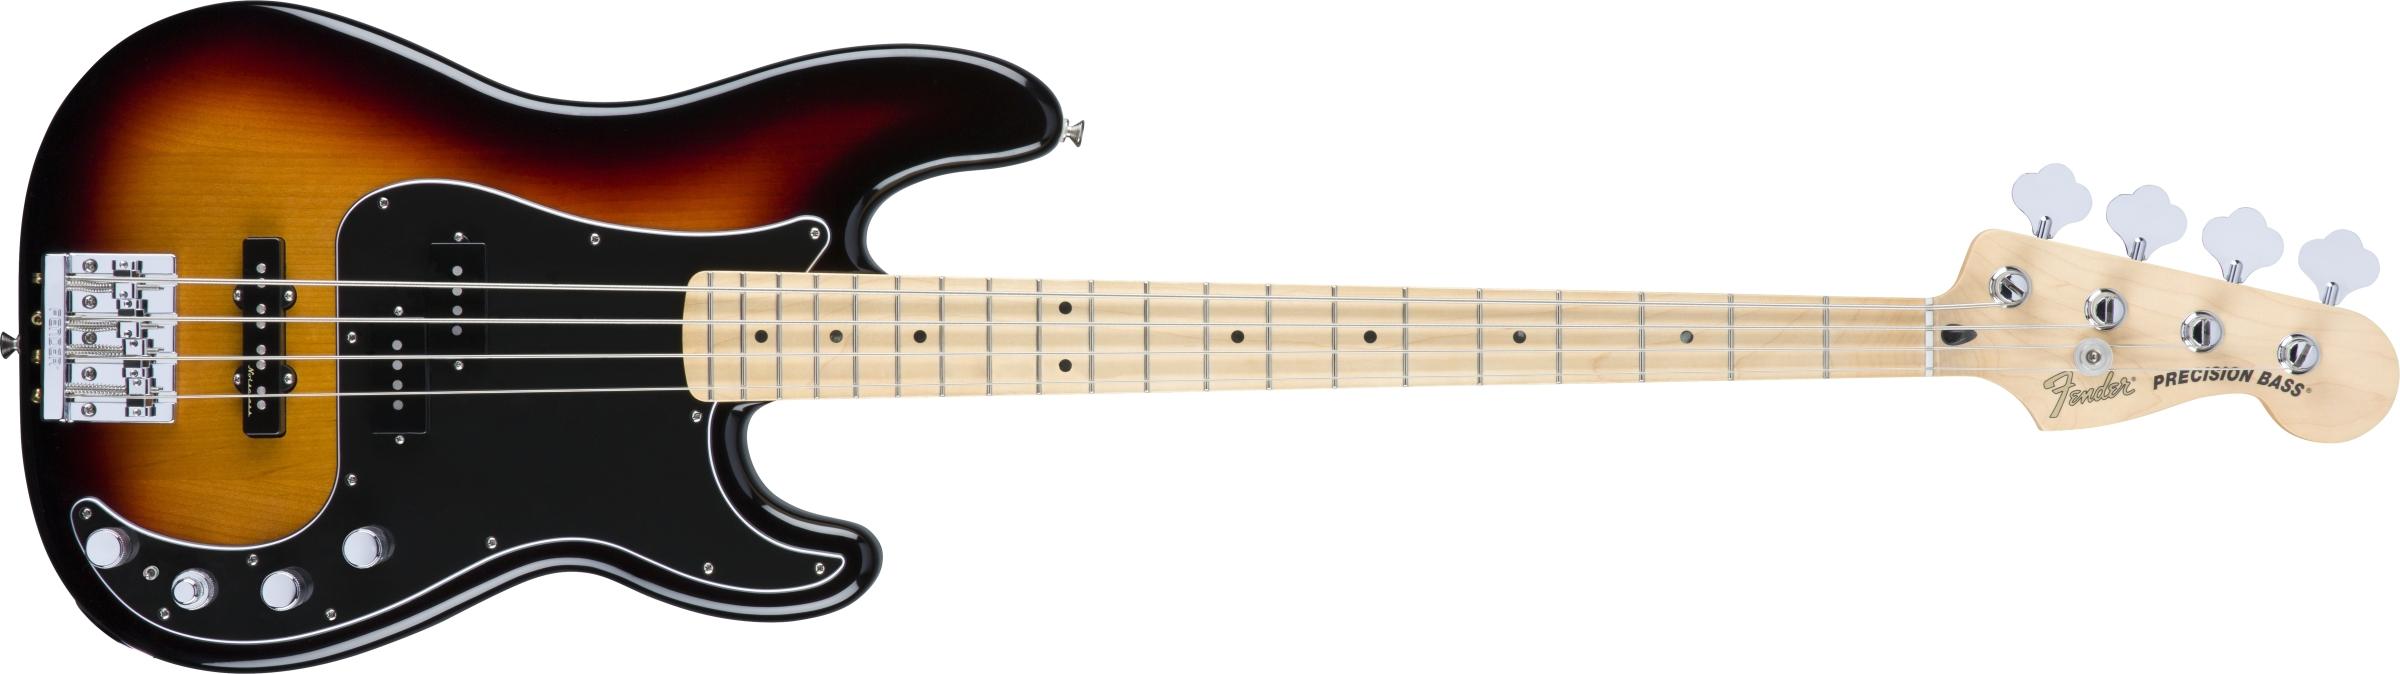 Fender Deluxe Active P Bass 174 Special Maple Fingerboard 3